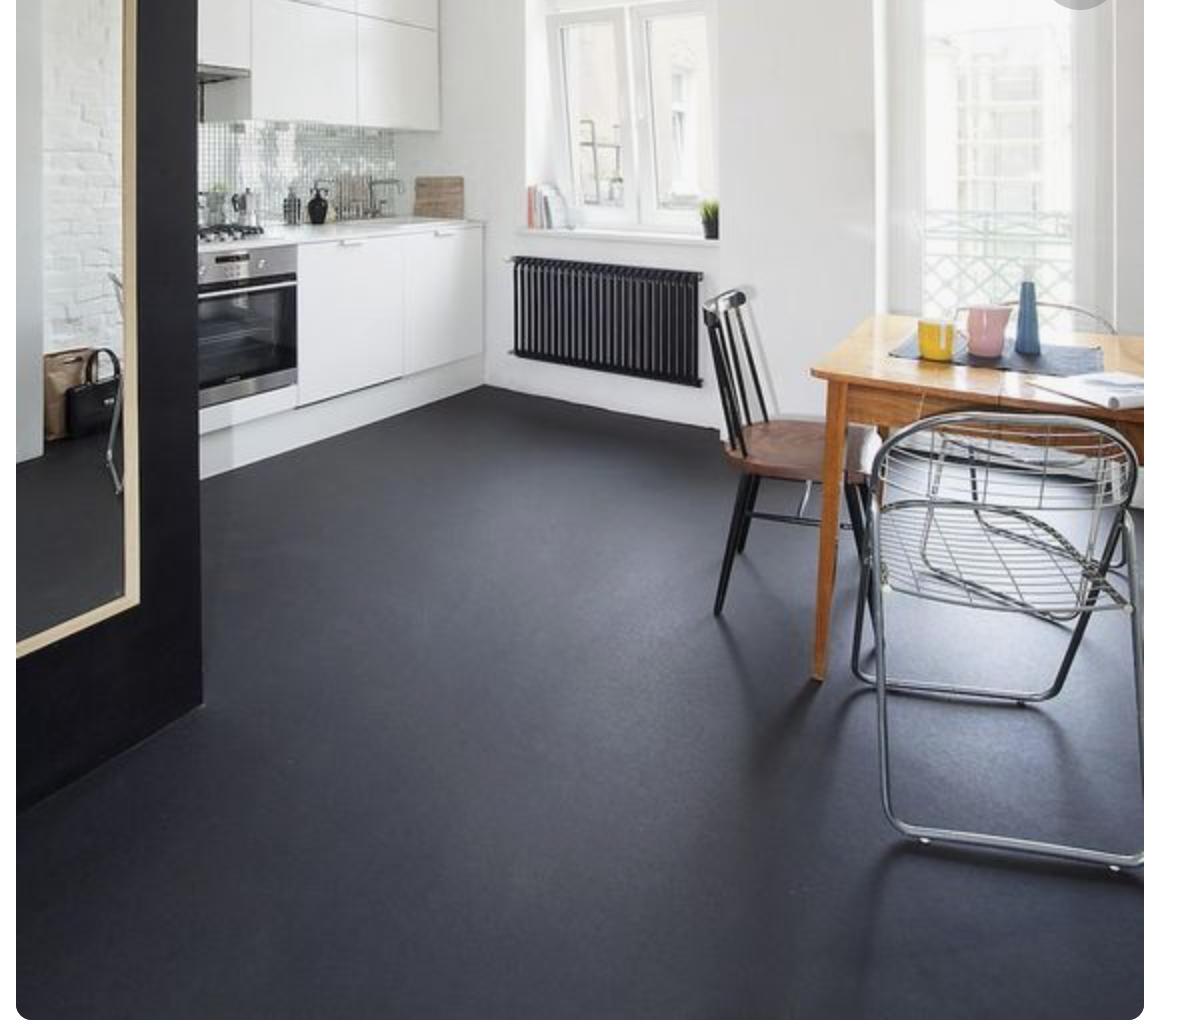 black painted concrete floors Concrete floors bedroom